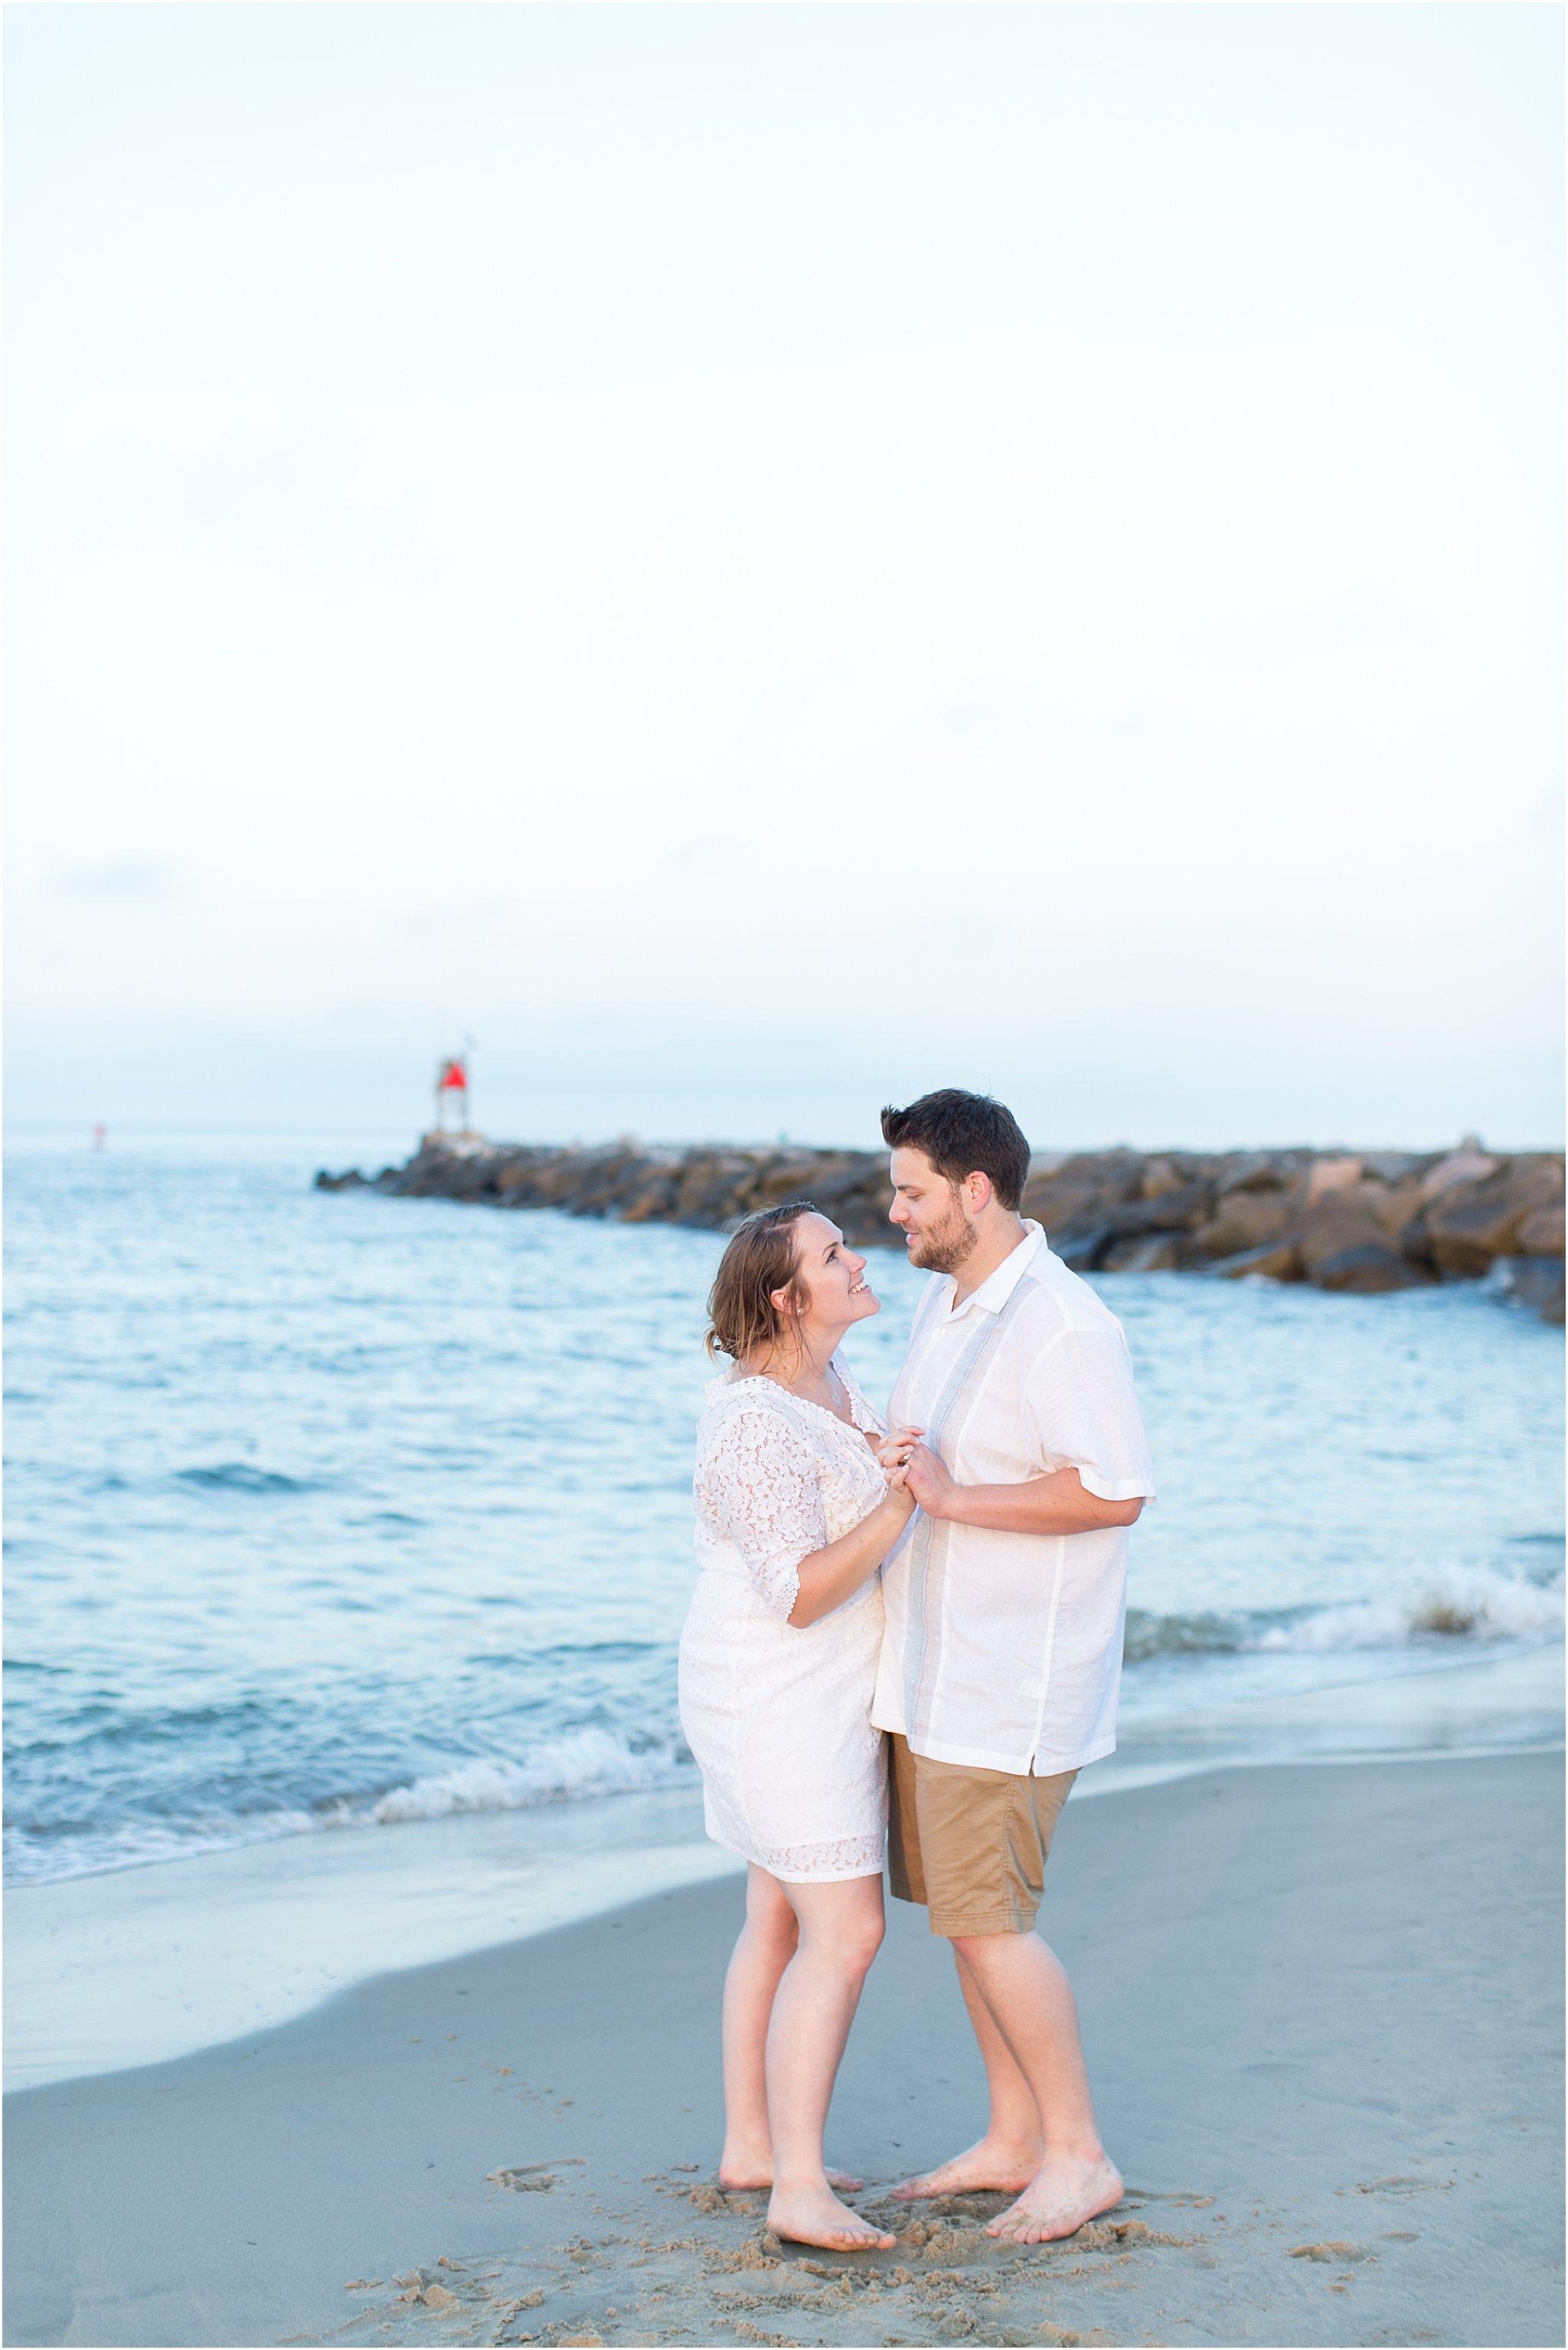 jessica_ryan_photography_wedding_photographs_must_haves_bride_top_wedding_photographs_virginia_wedding_photographer_2039